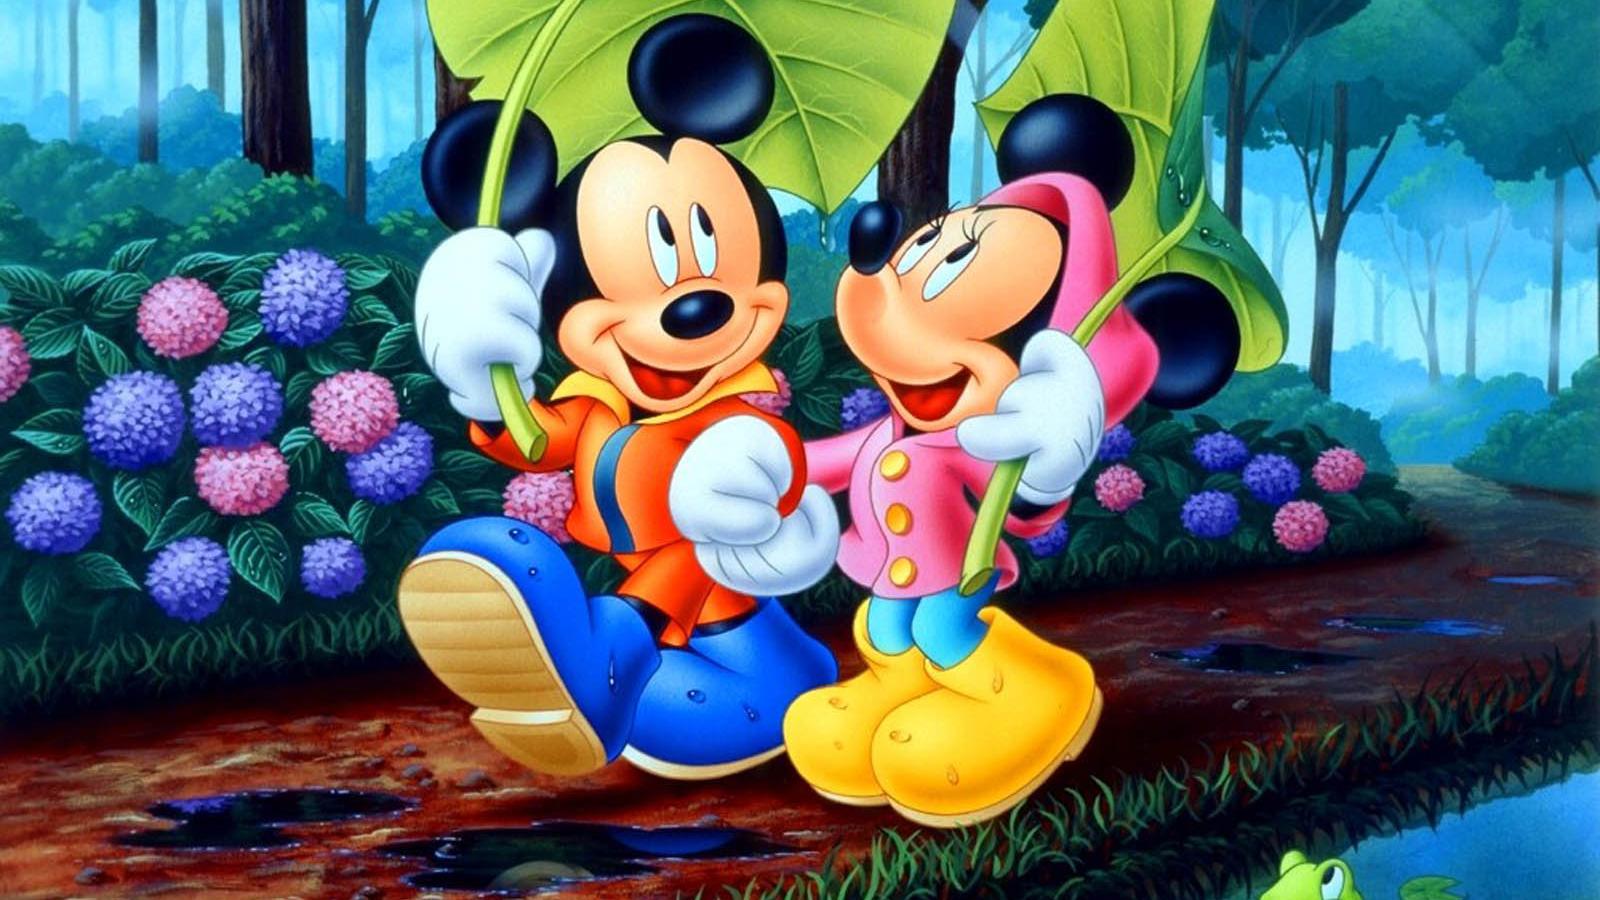 Free Gambar Wallpaper Mickey Mouse Lucu [